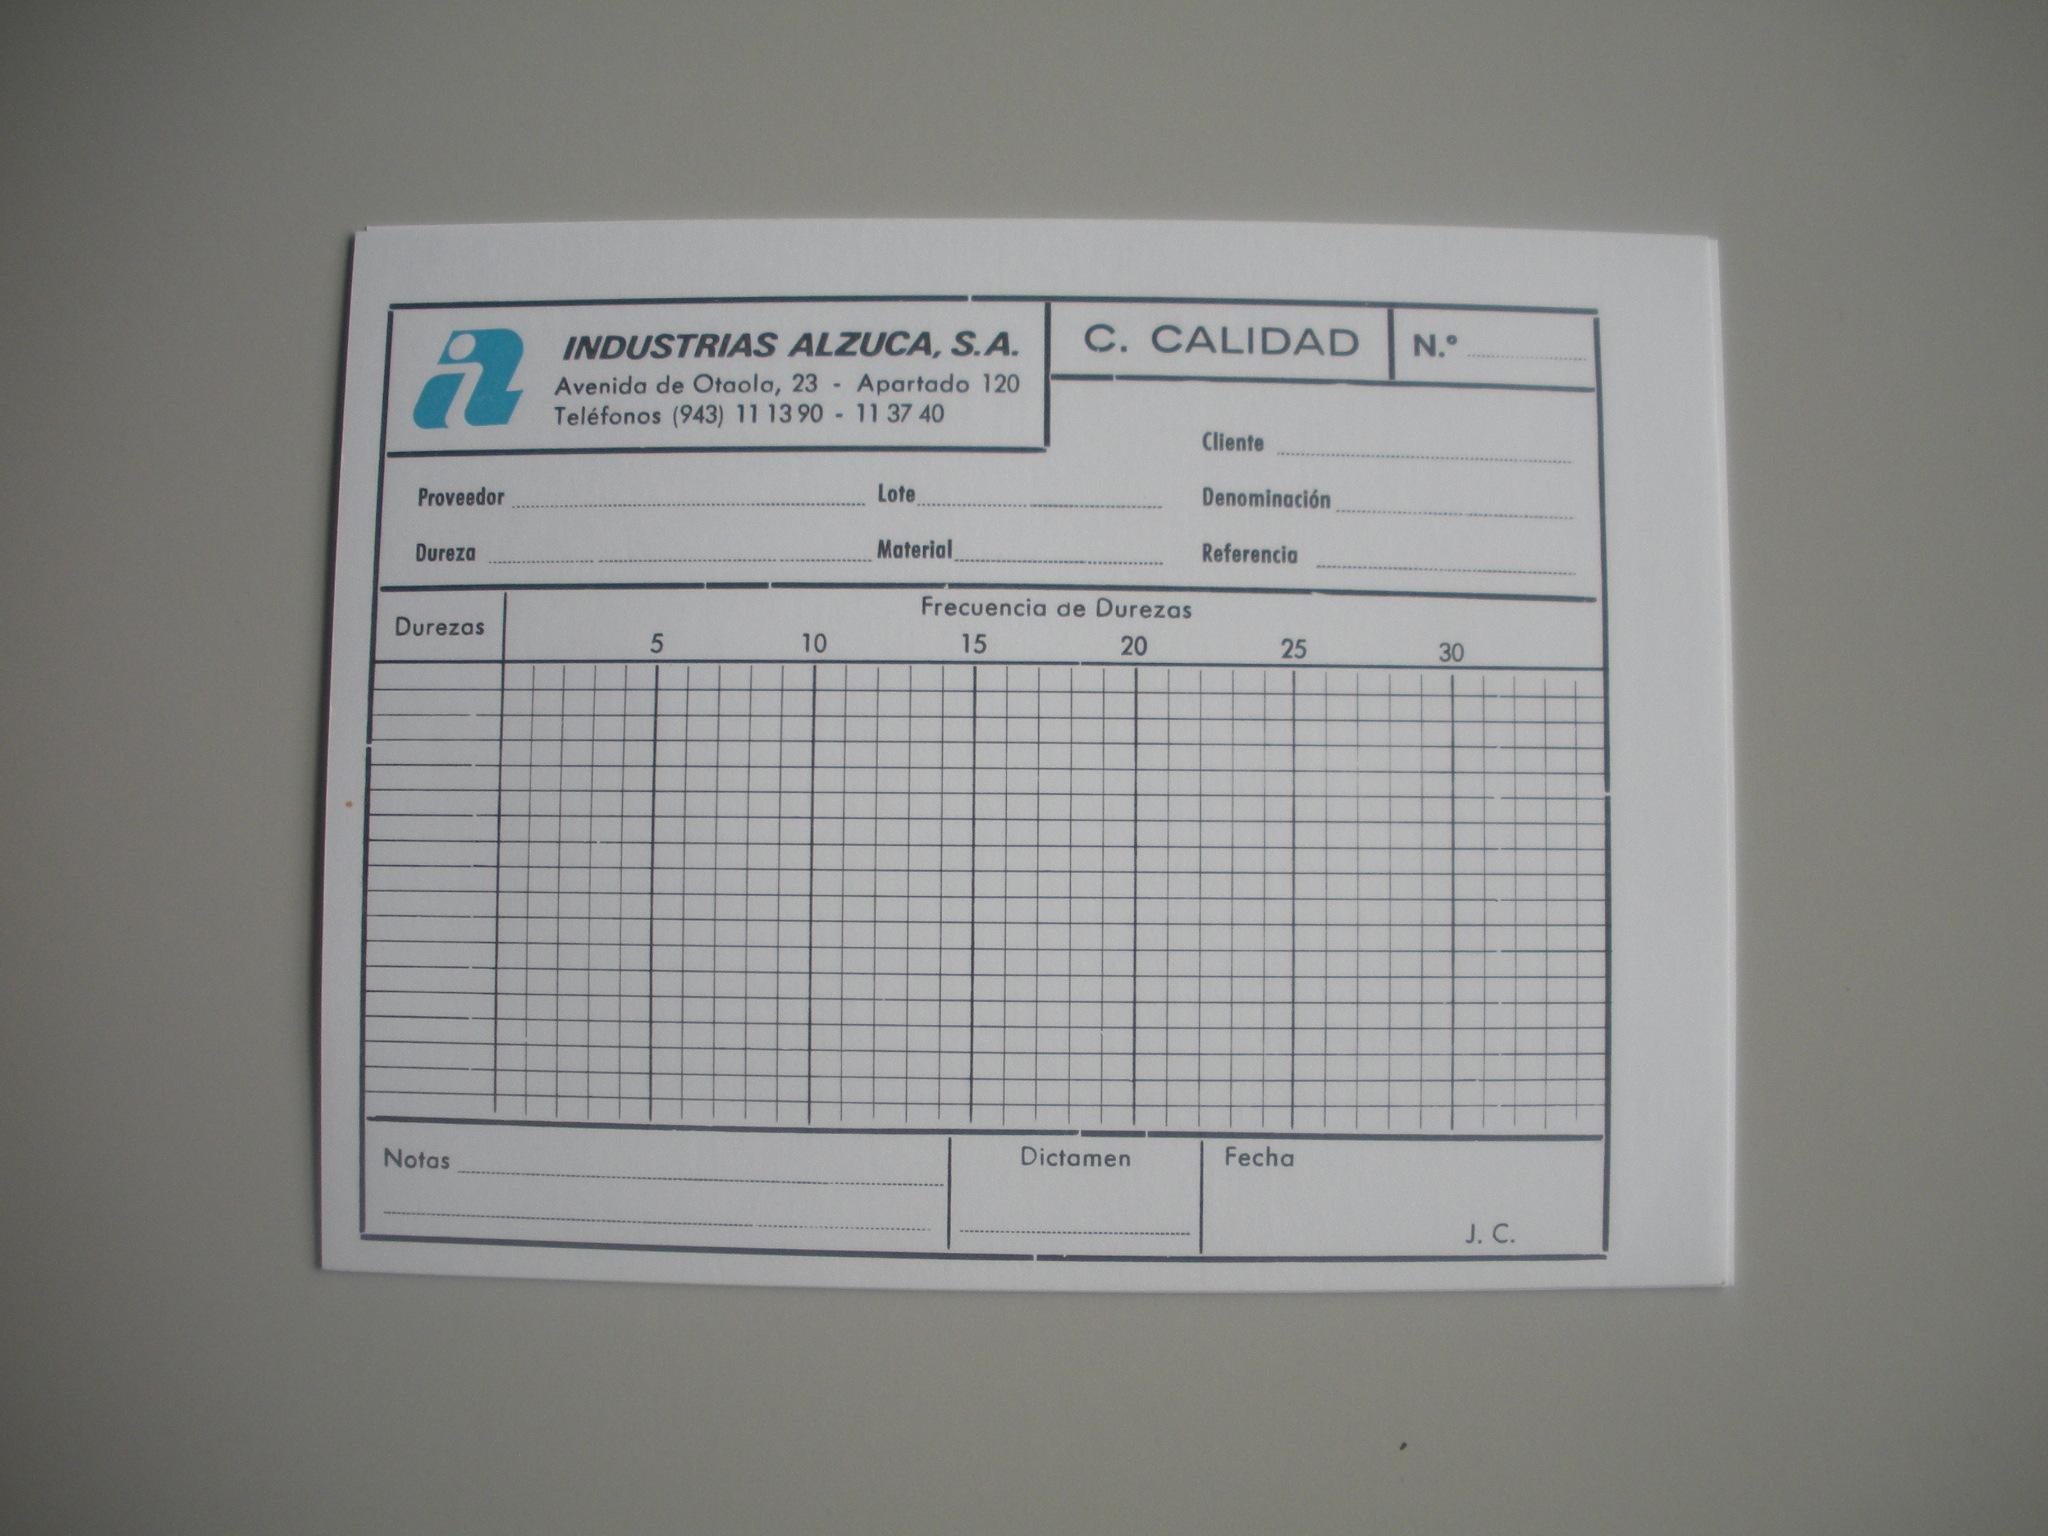 TARJETA DE CONTROL DE CALIDAD DE INDSUTRIAS ALZUCA, S.A.